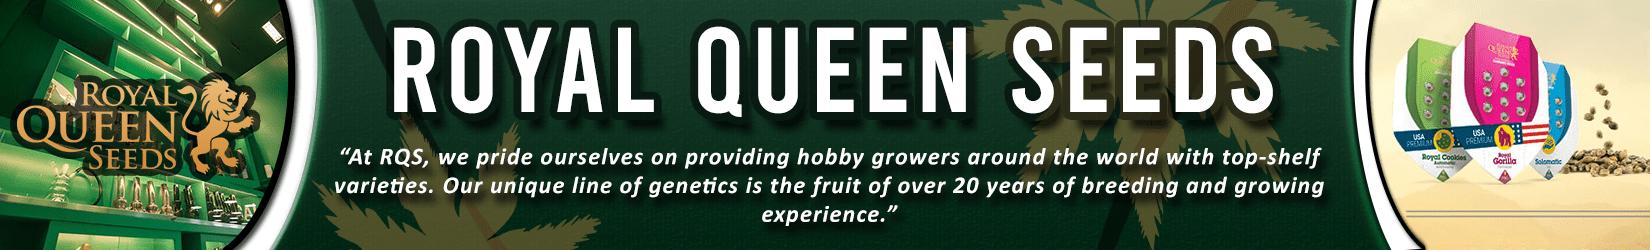 Cannabis Seeds Breeder - Royal Queen Seeds